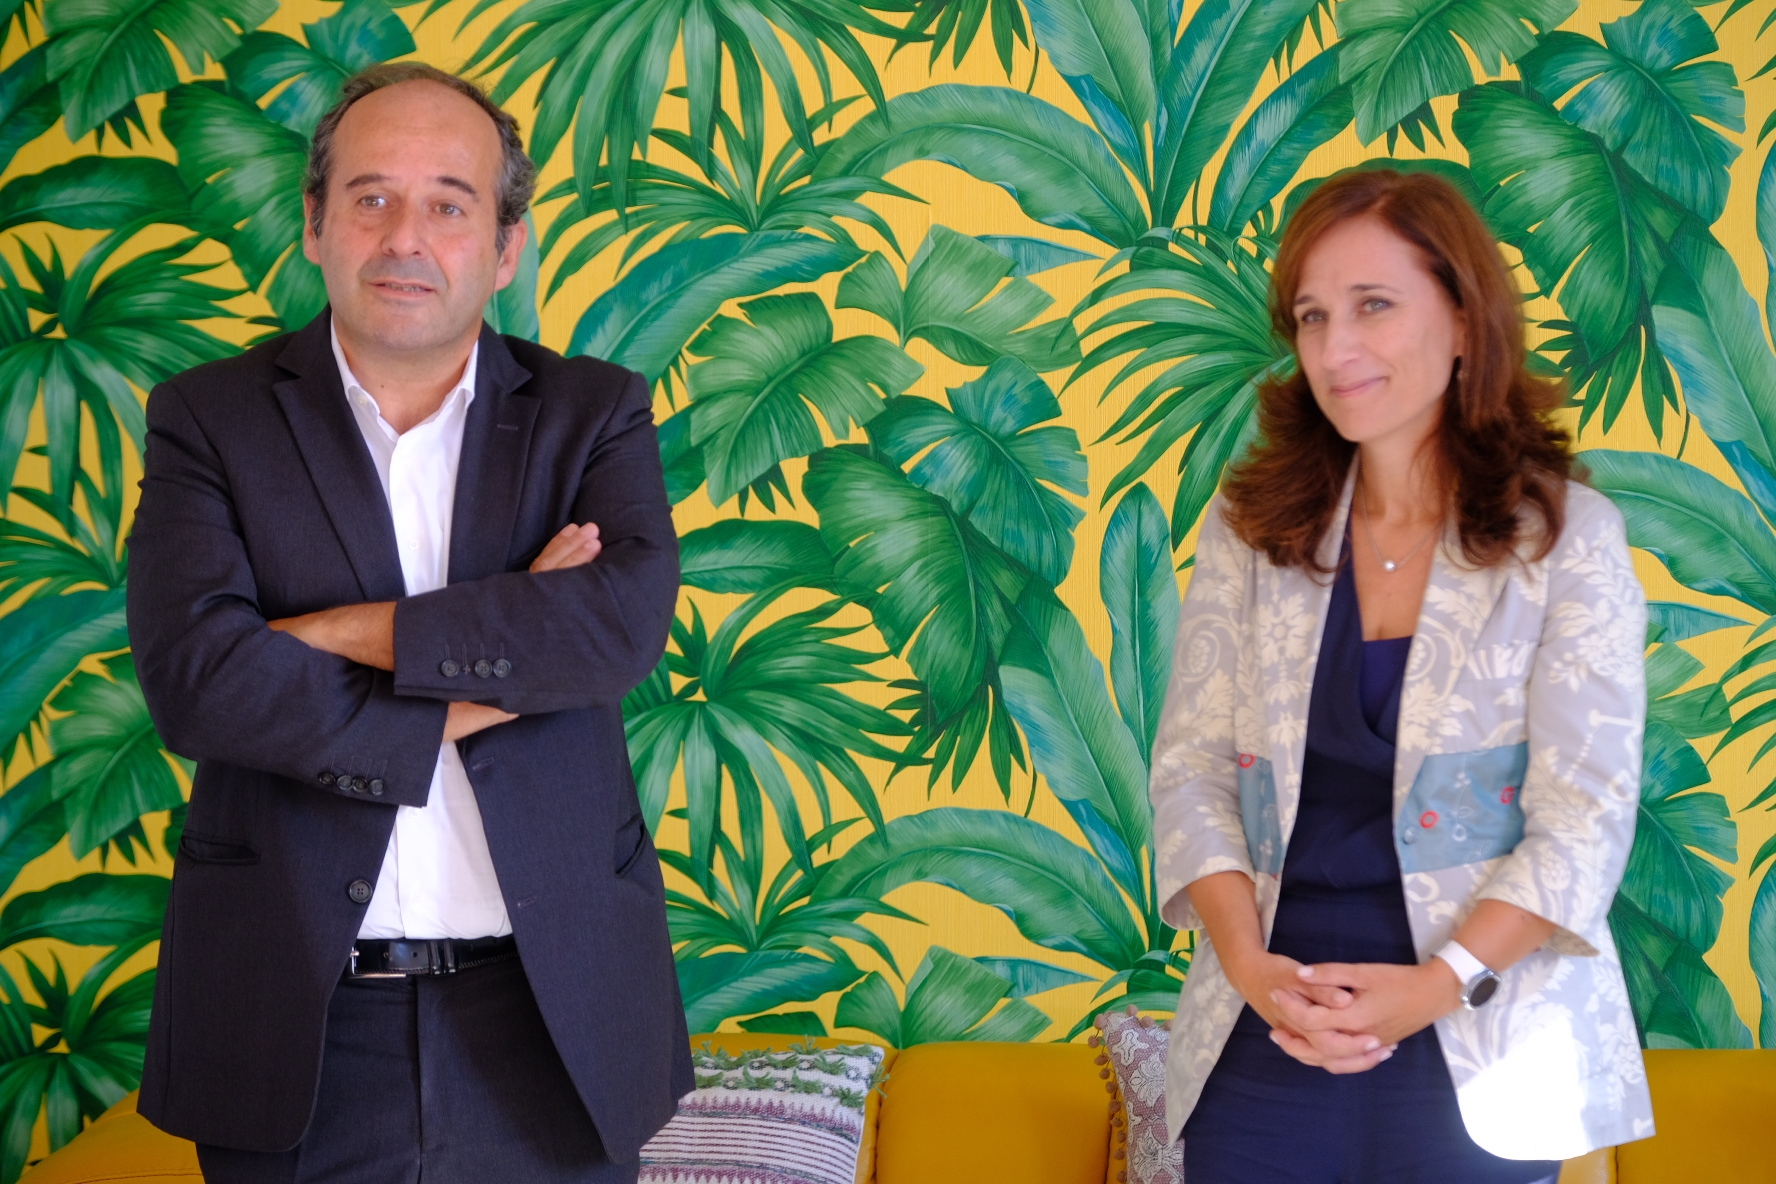 Pedro Bruno e Catarina Aleixo